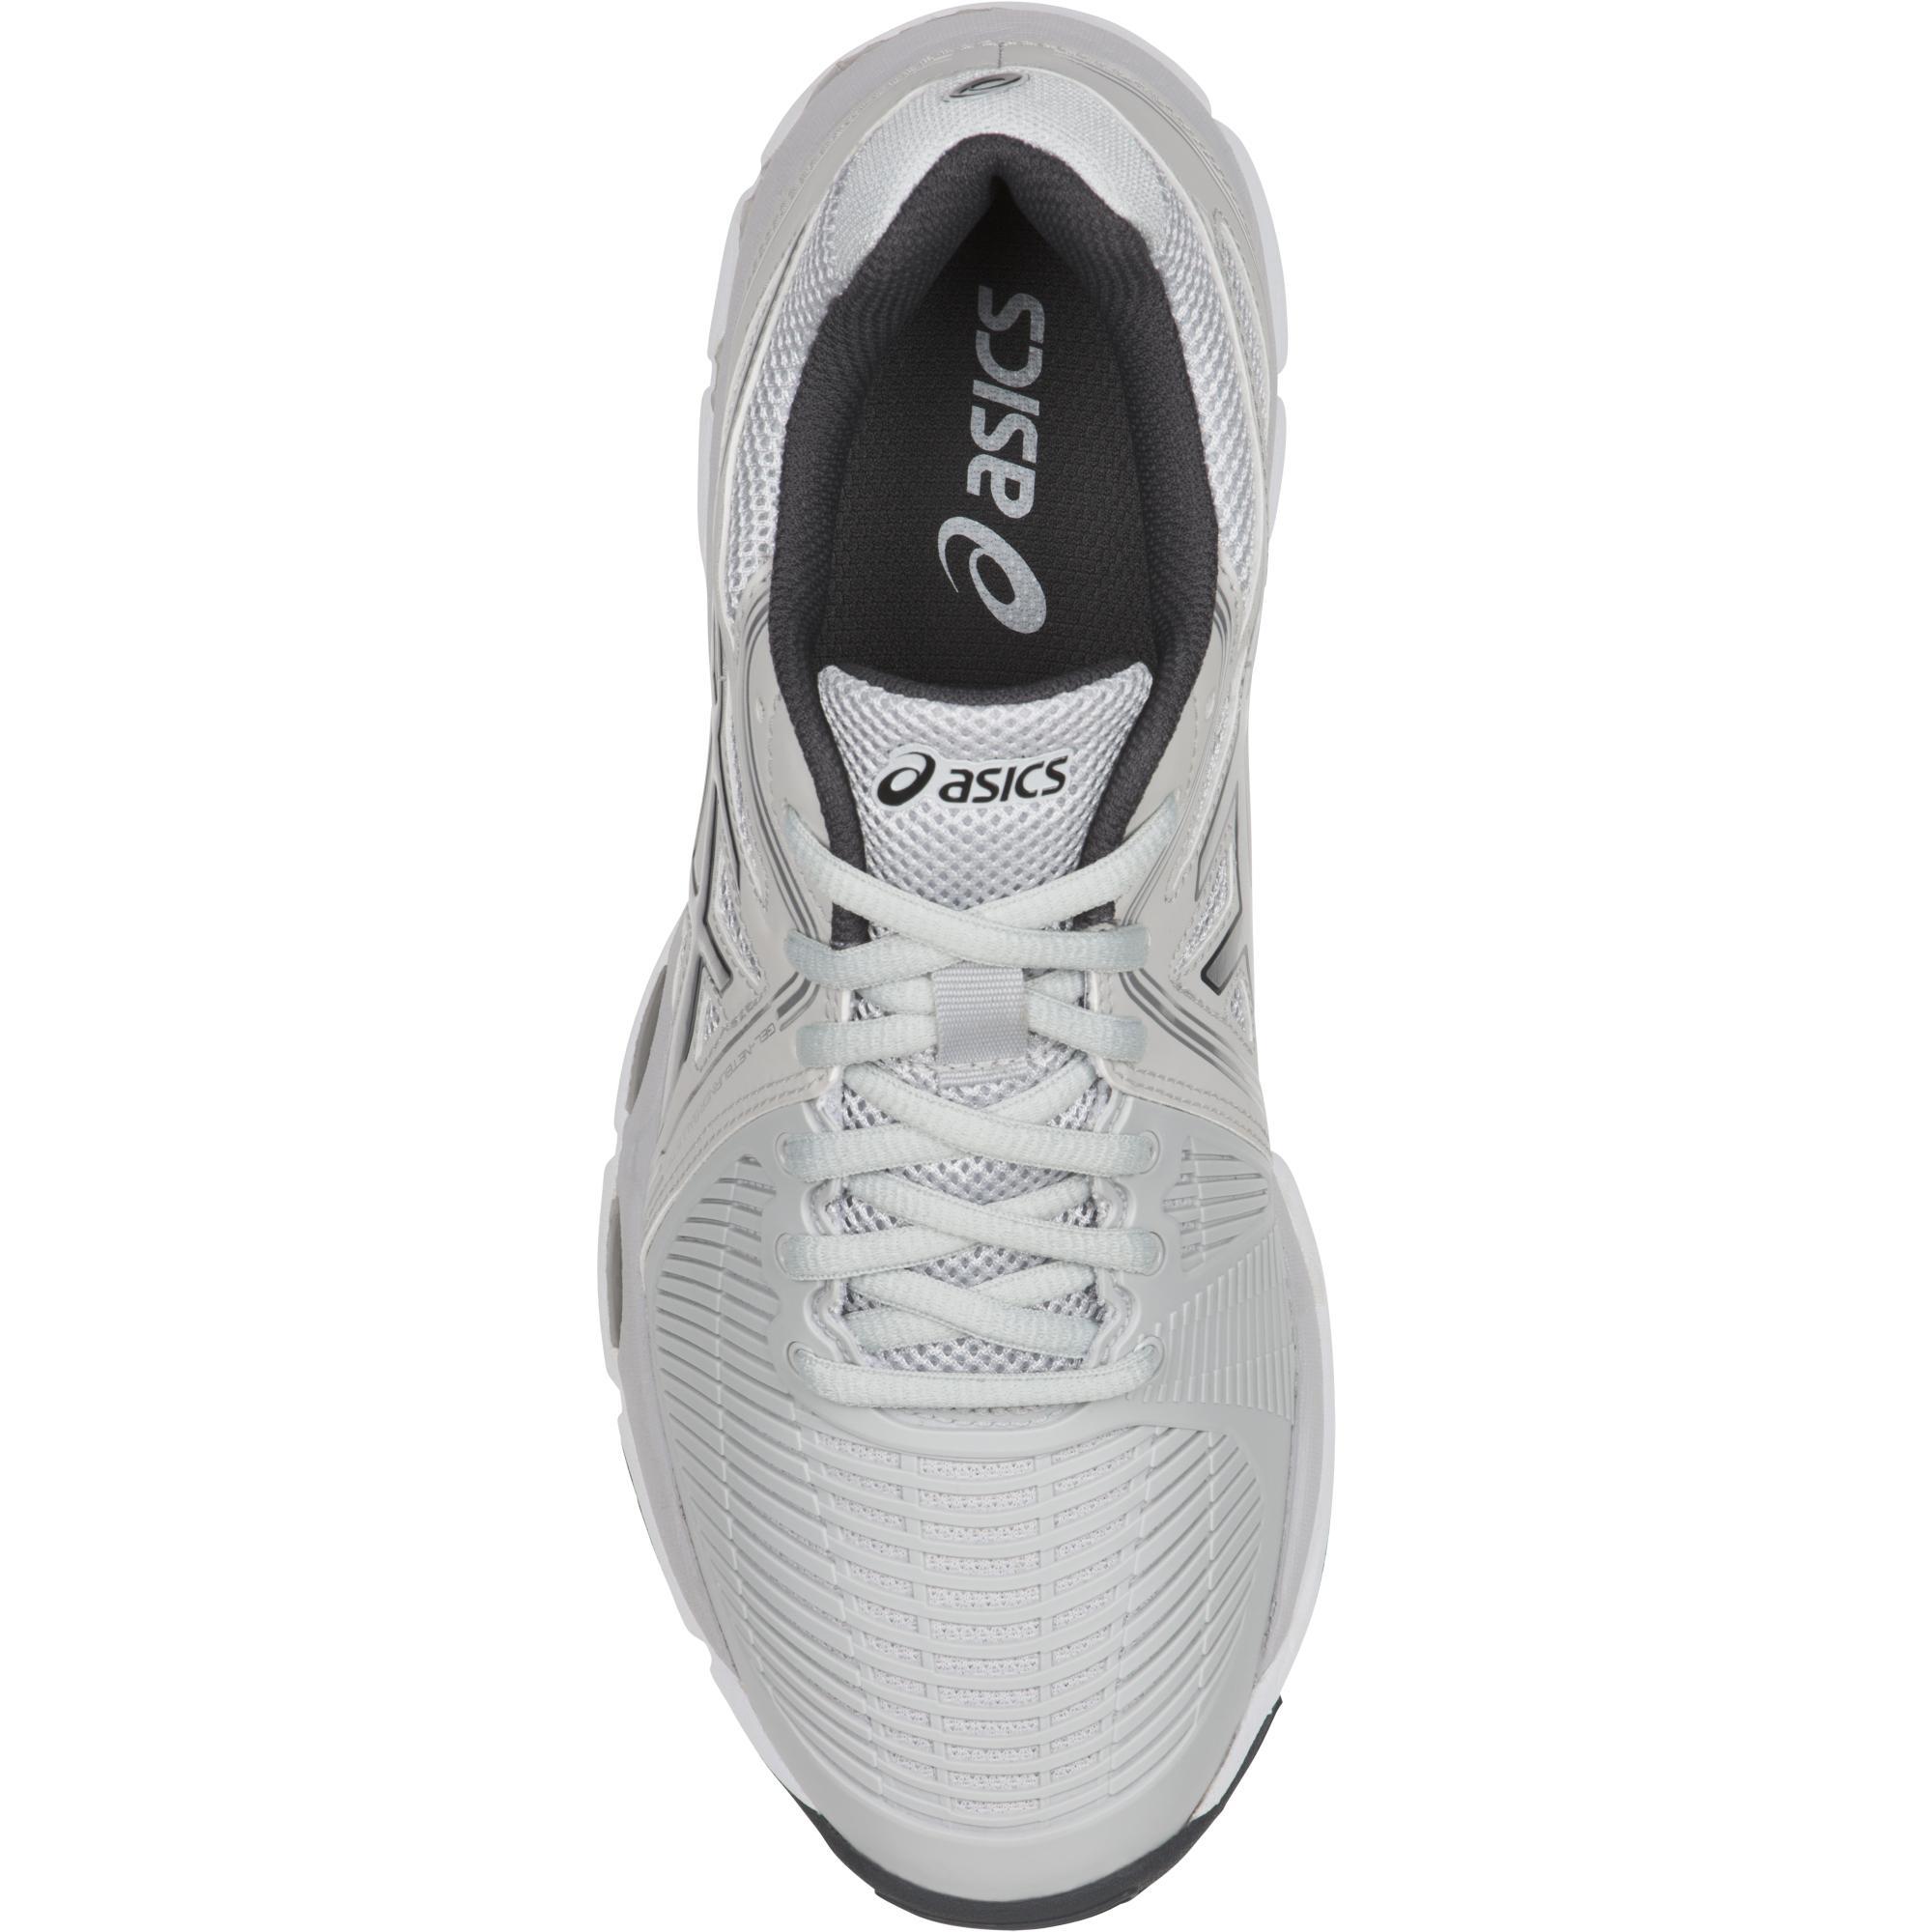 Asics Womens GEL-Netburner Ballistic Shoes - Dark Grey - Tennisnuts.com 9400630cb8d1